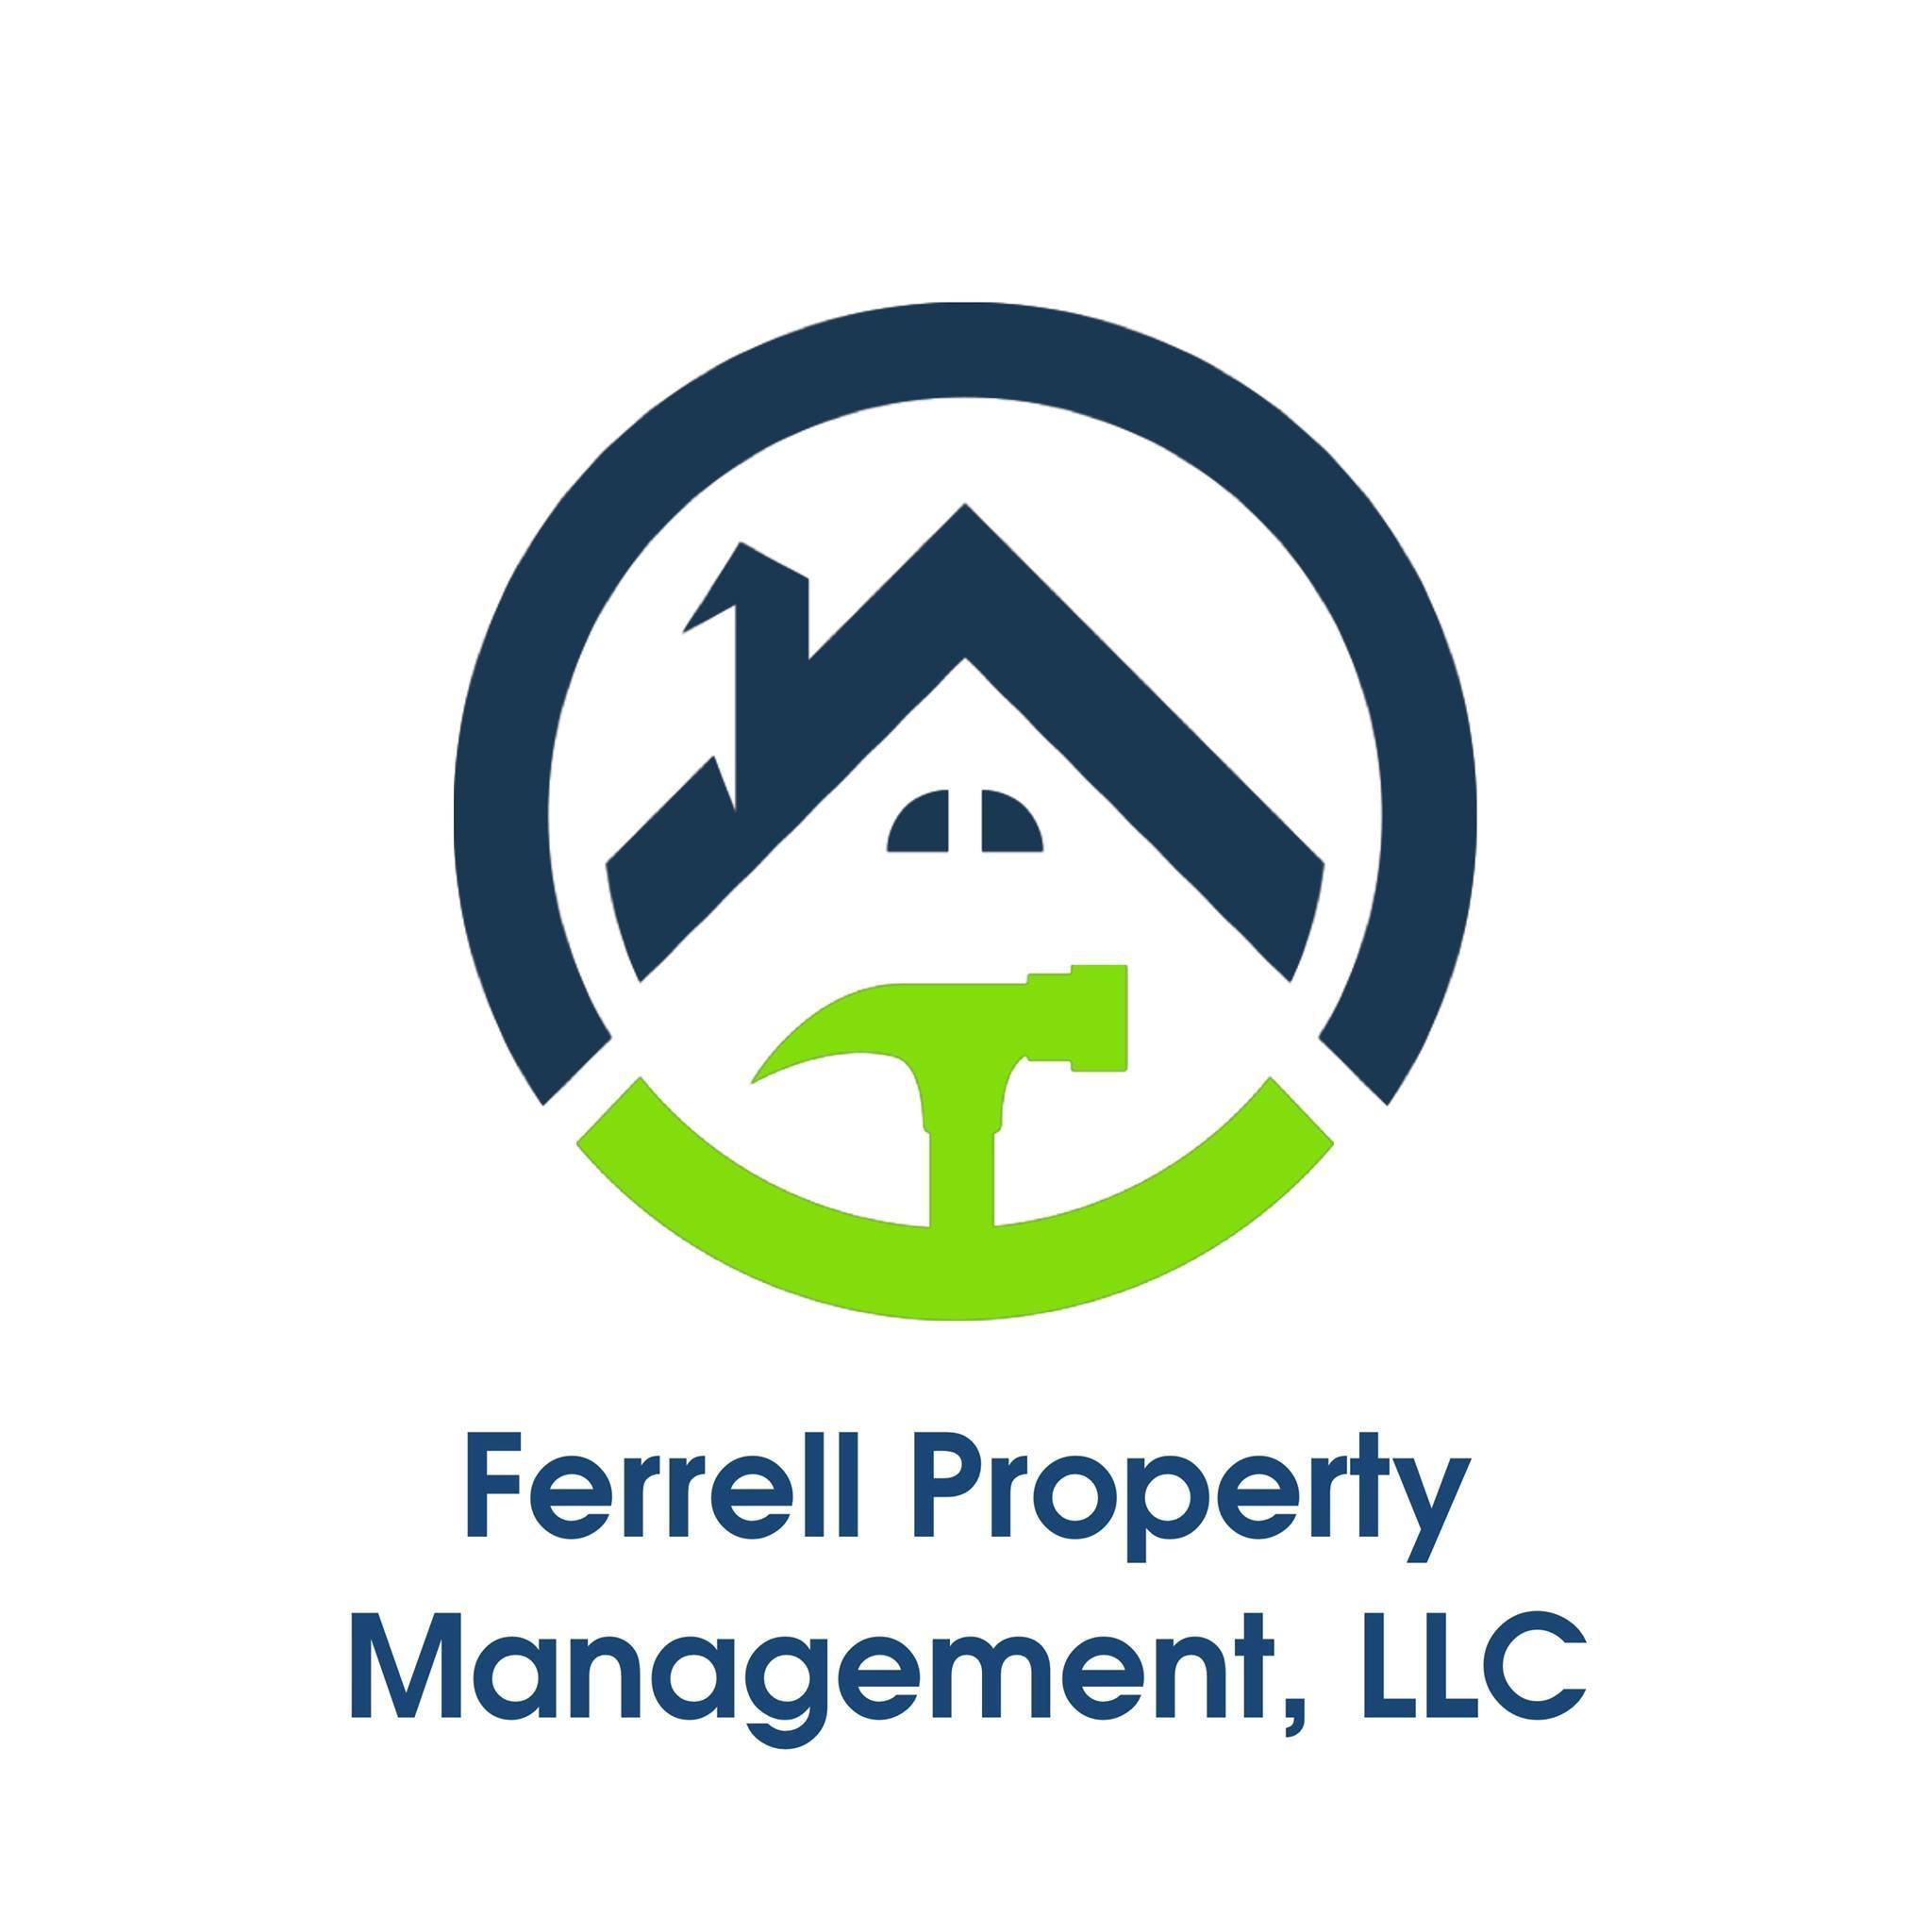 Ferrell Property Management